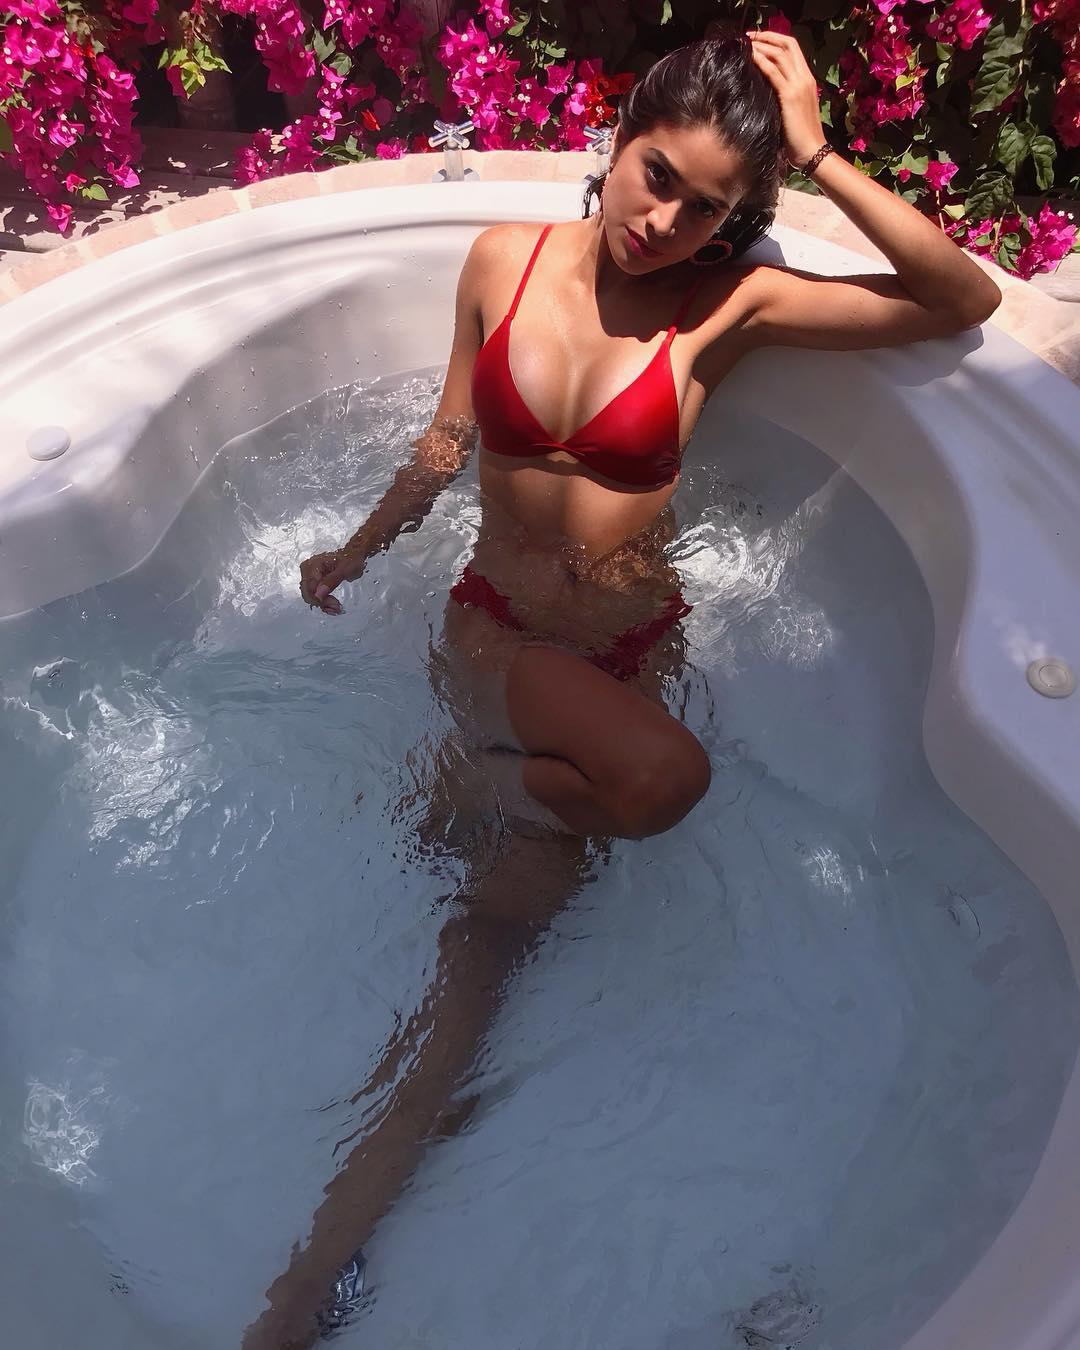 lucia arellano, top 6 de miss peru 2019.  - Página 2 41151110